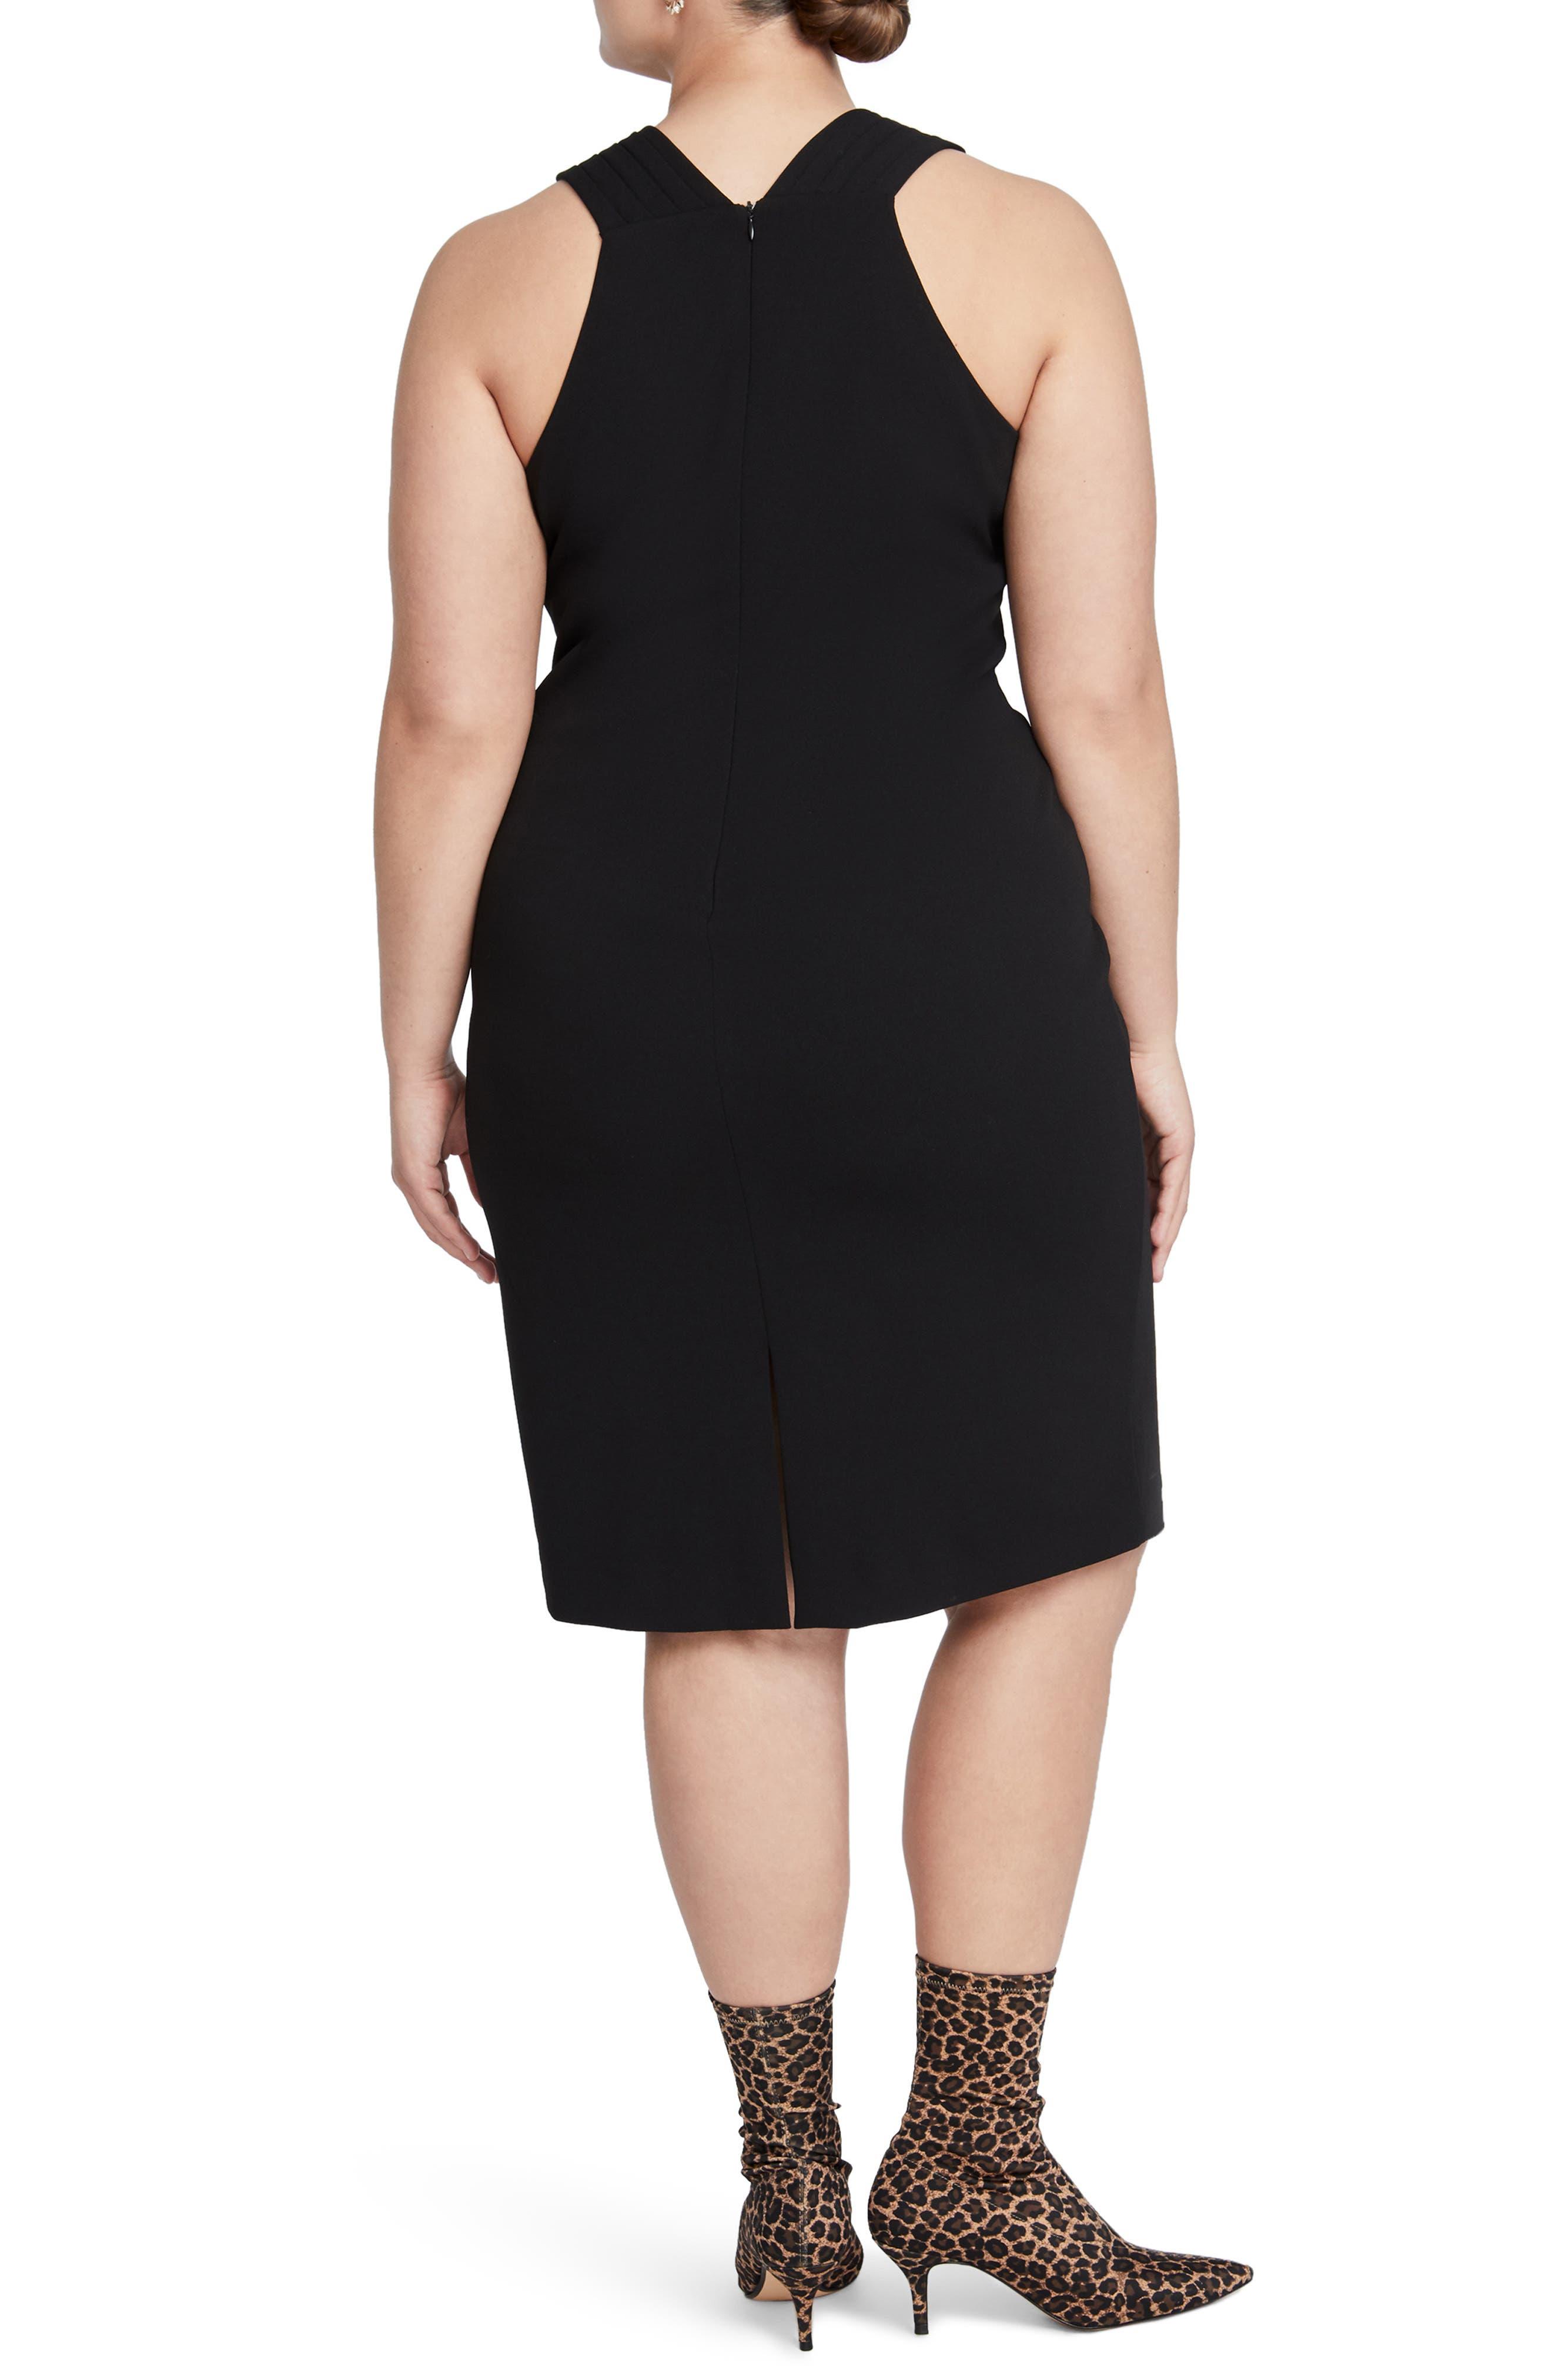 Prynn Sheath Dress,                             Alternate thumbnail 2, color,                             001